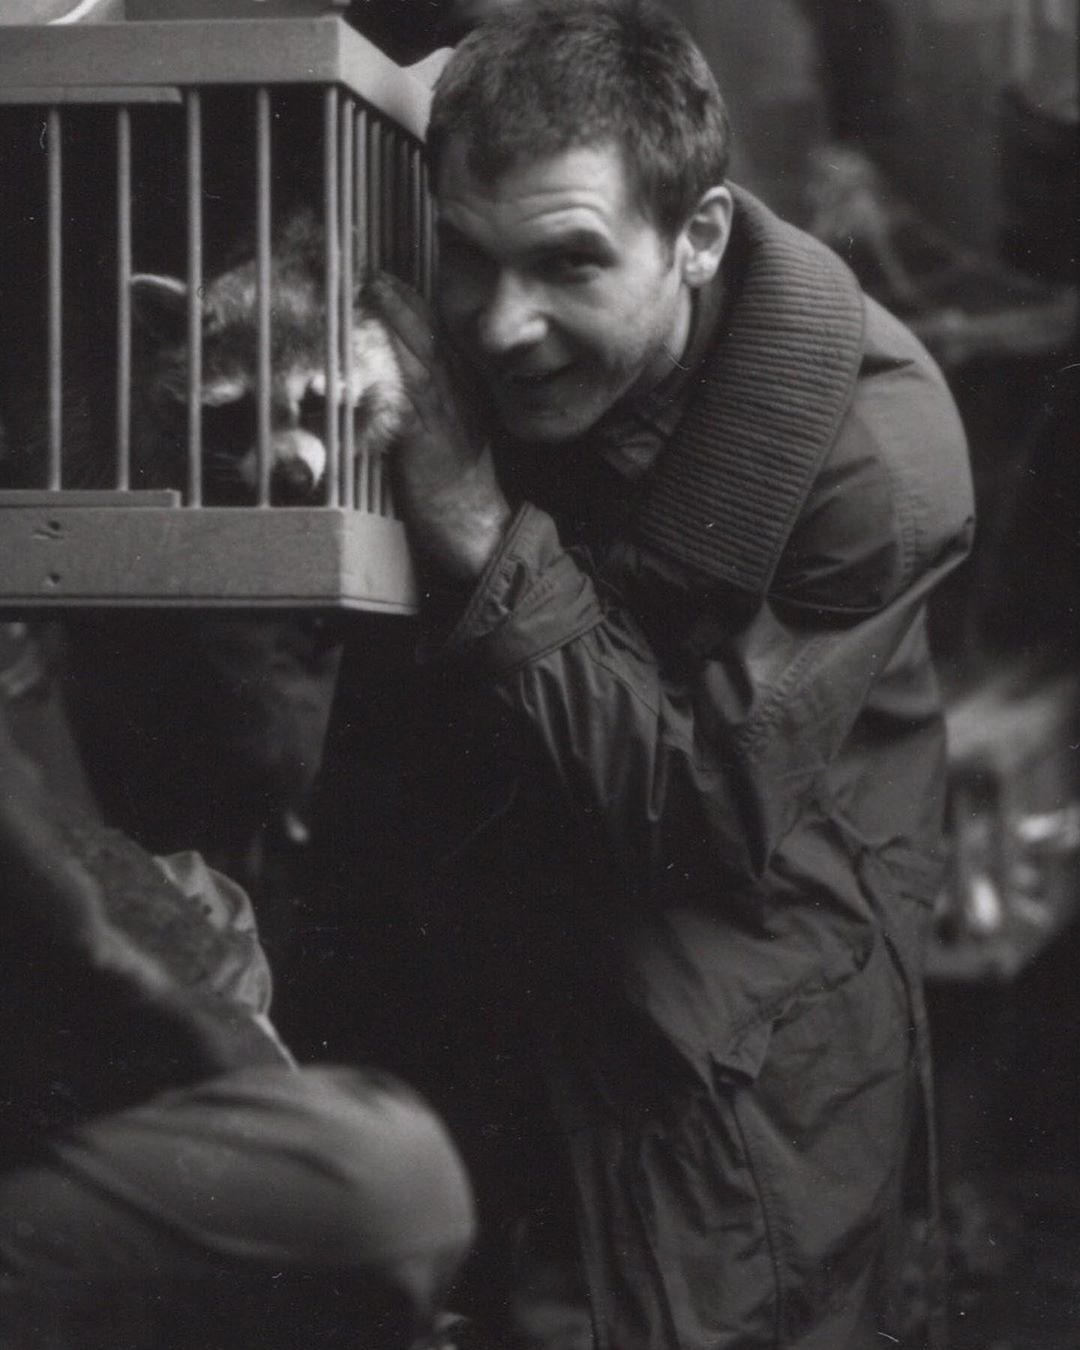 Харрисон Форд на съемках фильма «Бегущий по лезвию»